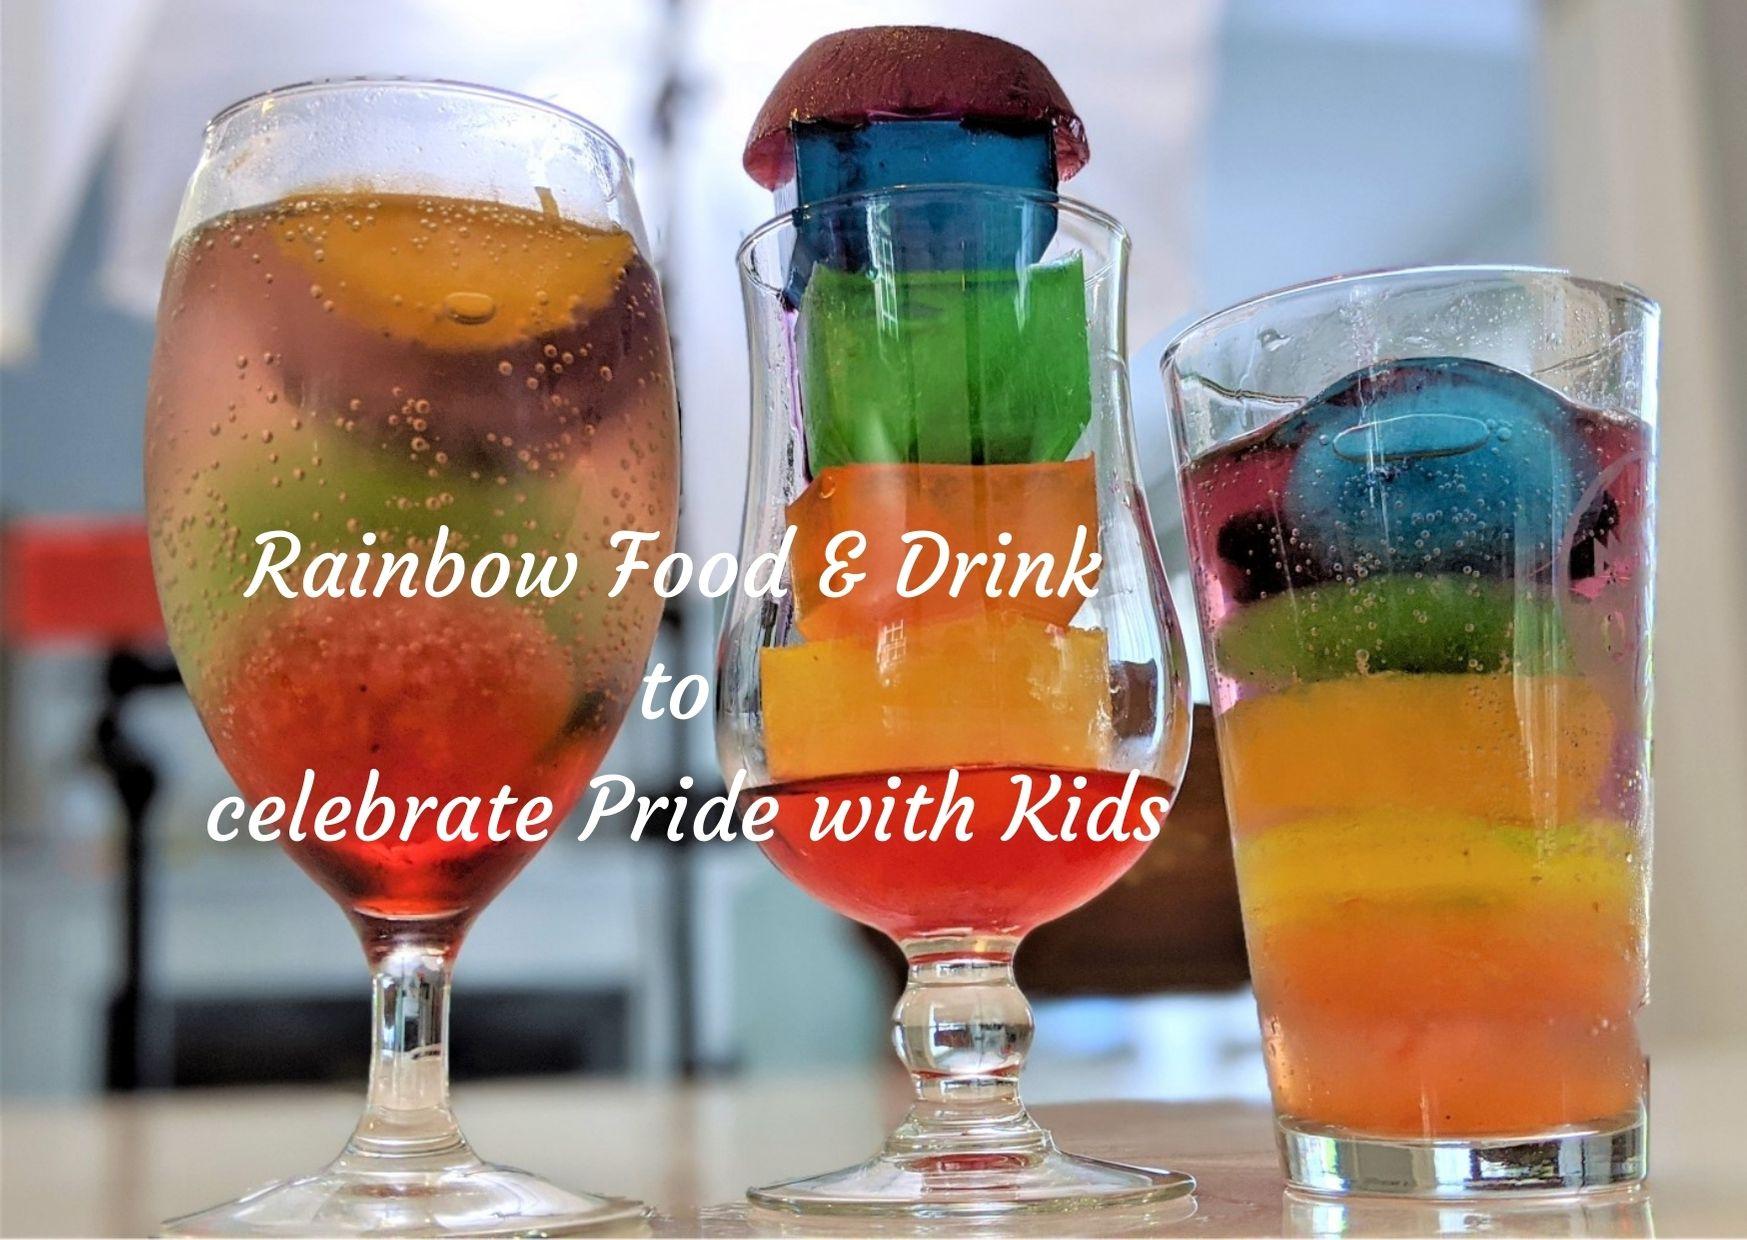 Rainbow ice in glasses for rainbow food